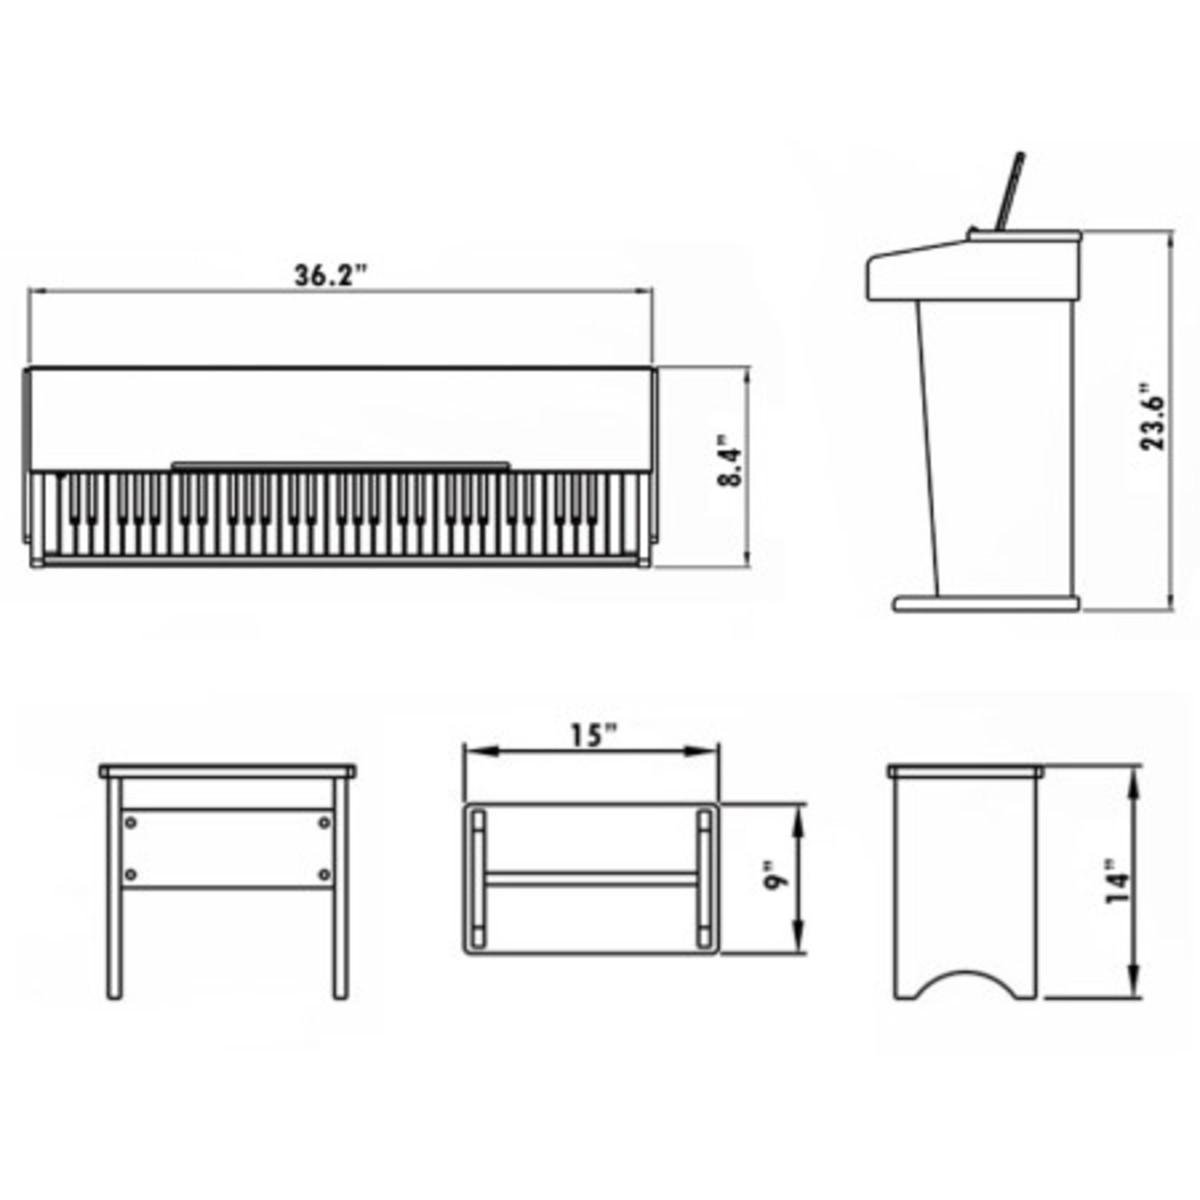 Jdp 1 junior piano digital de gear4music blanco b stock for Small piano dimensions